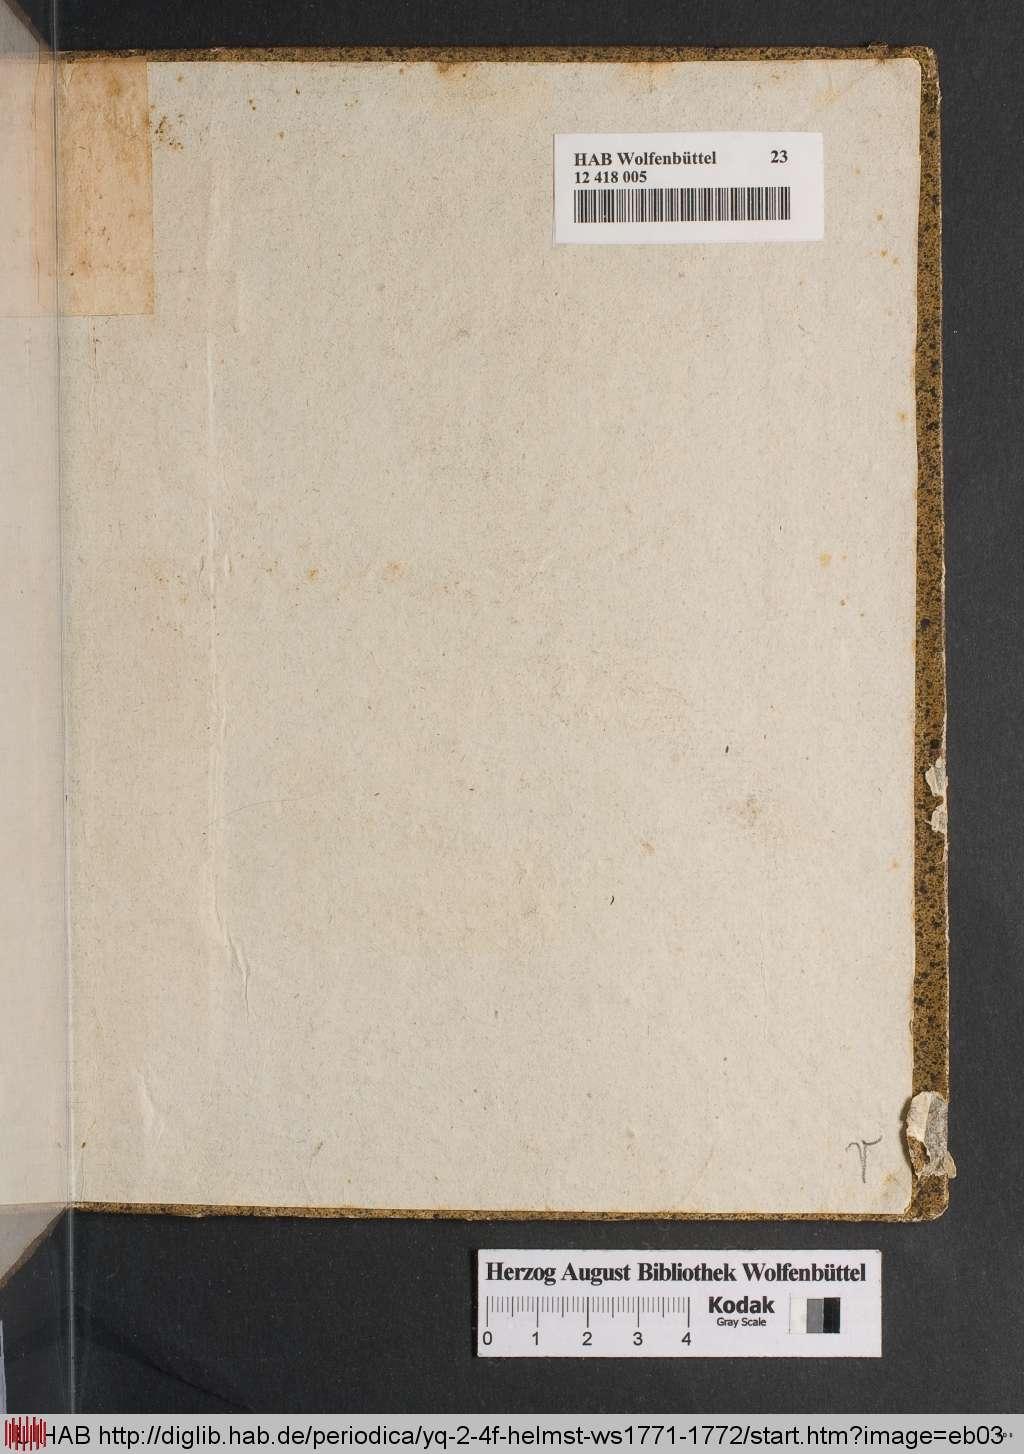 http://diglib.hab.de/periodica/yq-2-4f-helmst-ws1771-1772/eb03.jpg